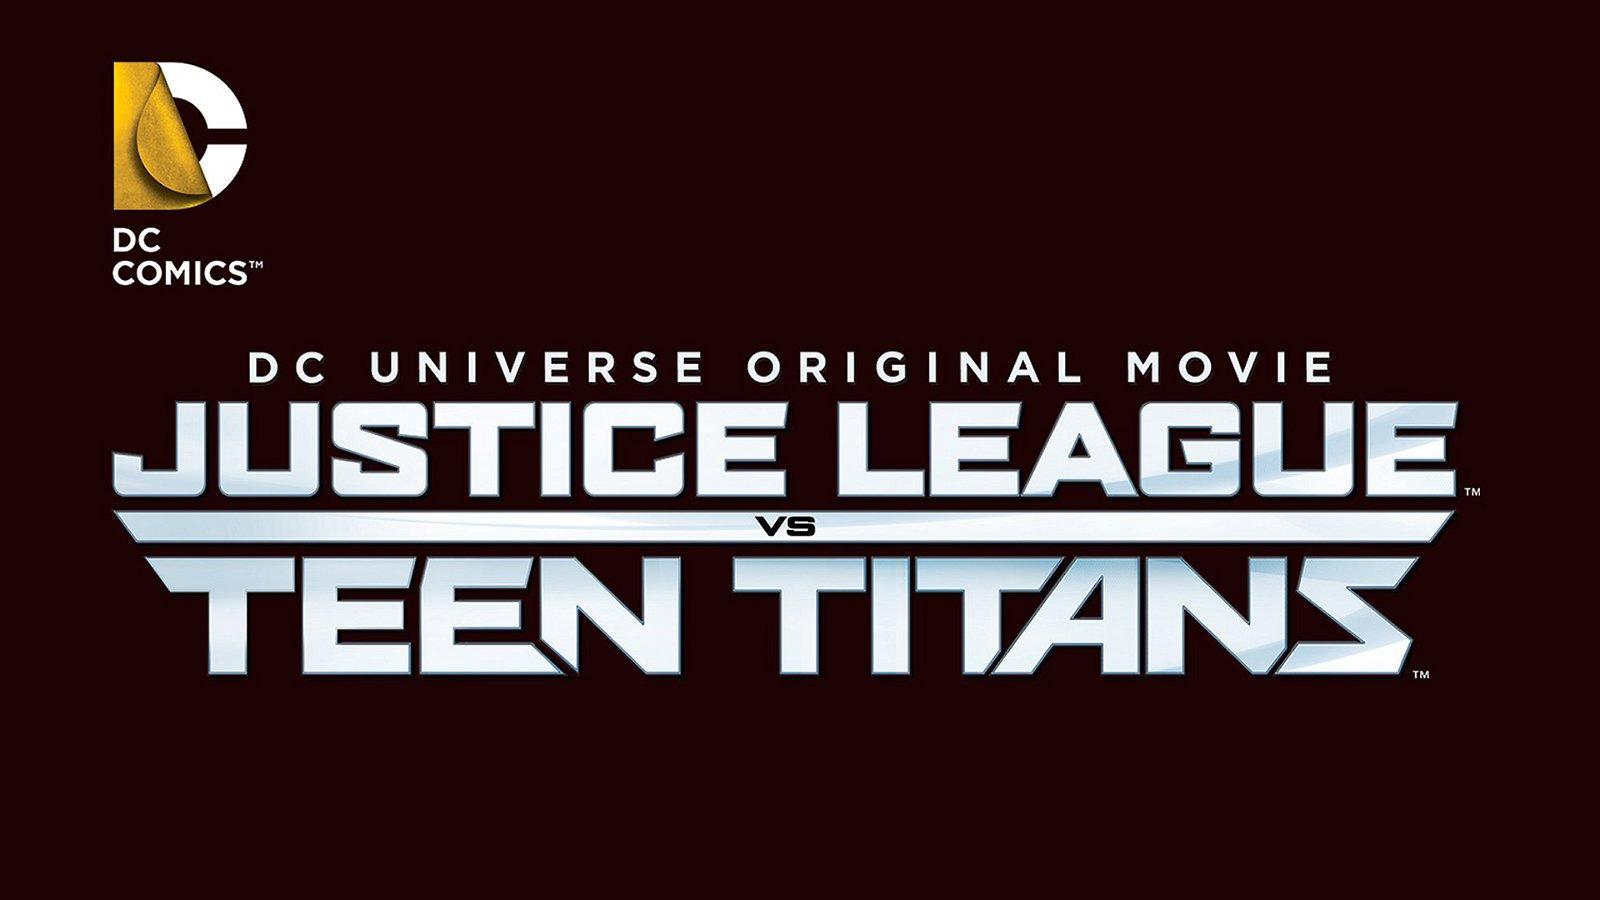 DCU Justice League vs Teen Titan Giveaway 2